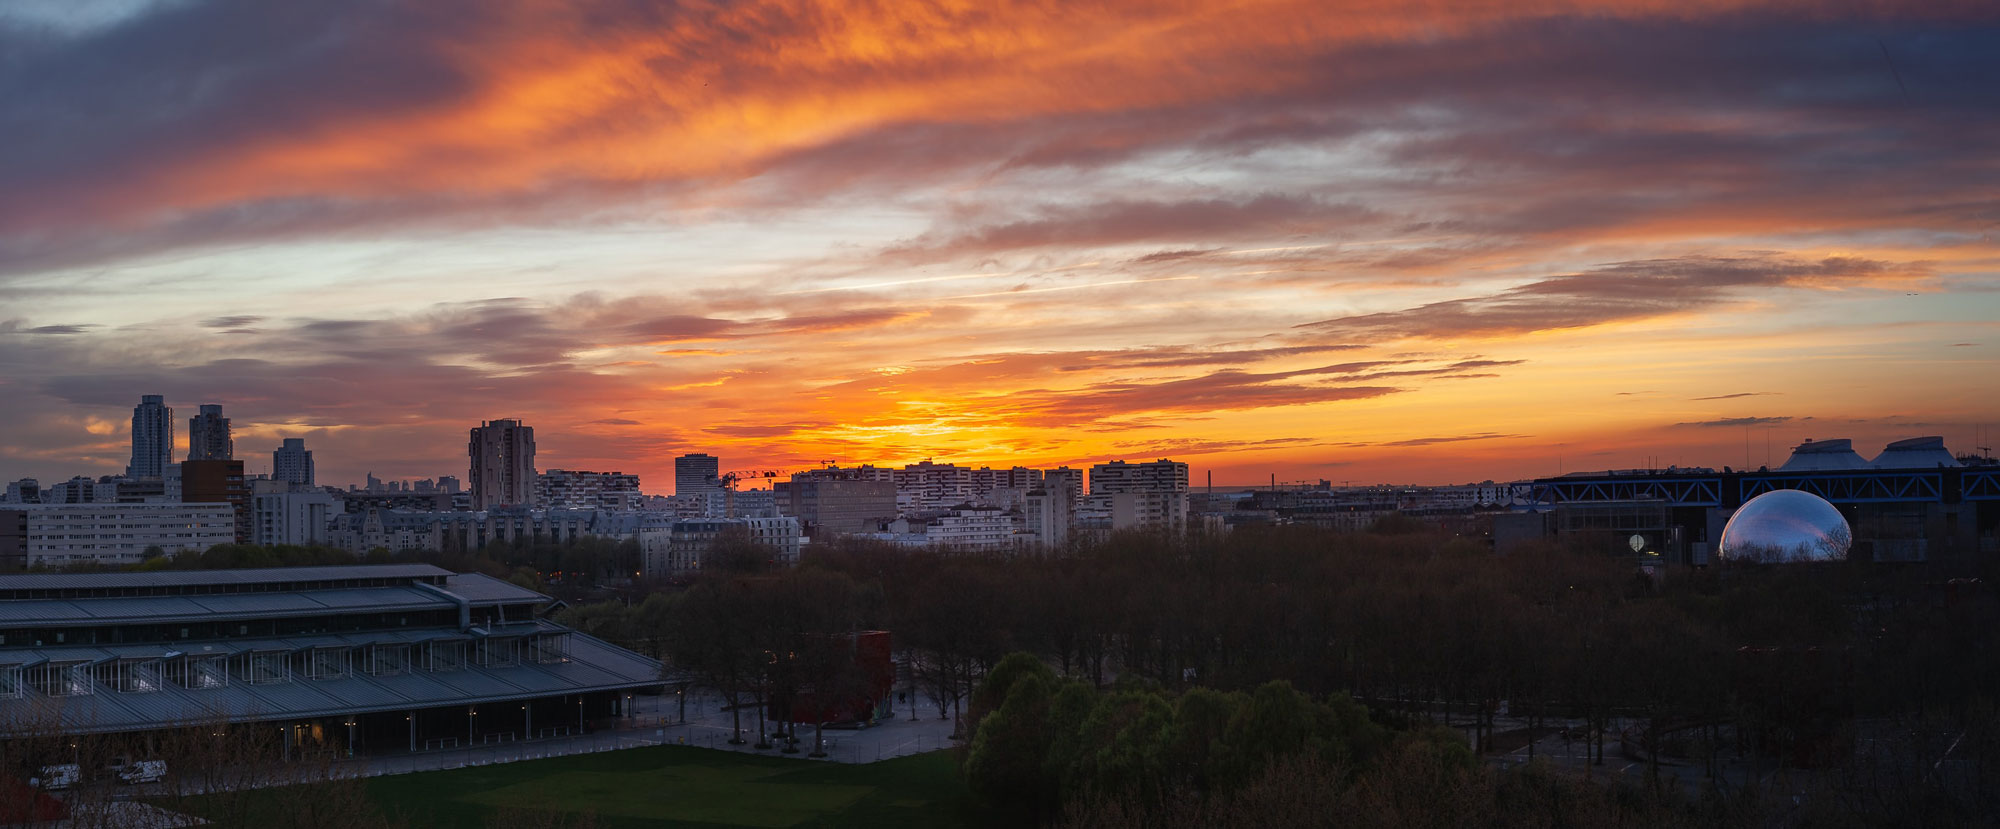 Rooftop - Le Balcon - Paris - Toi Toi Mon Toit